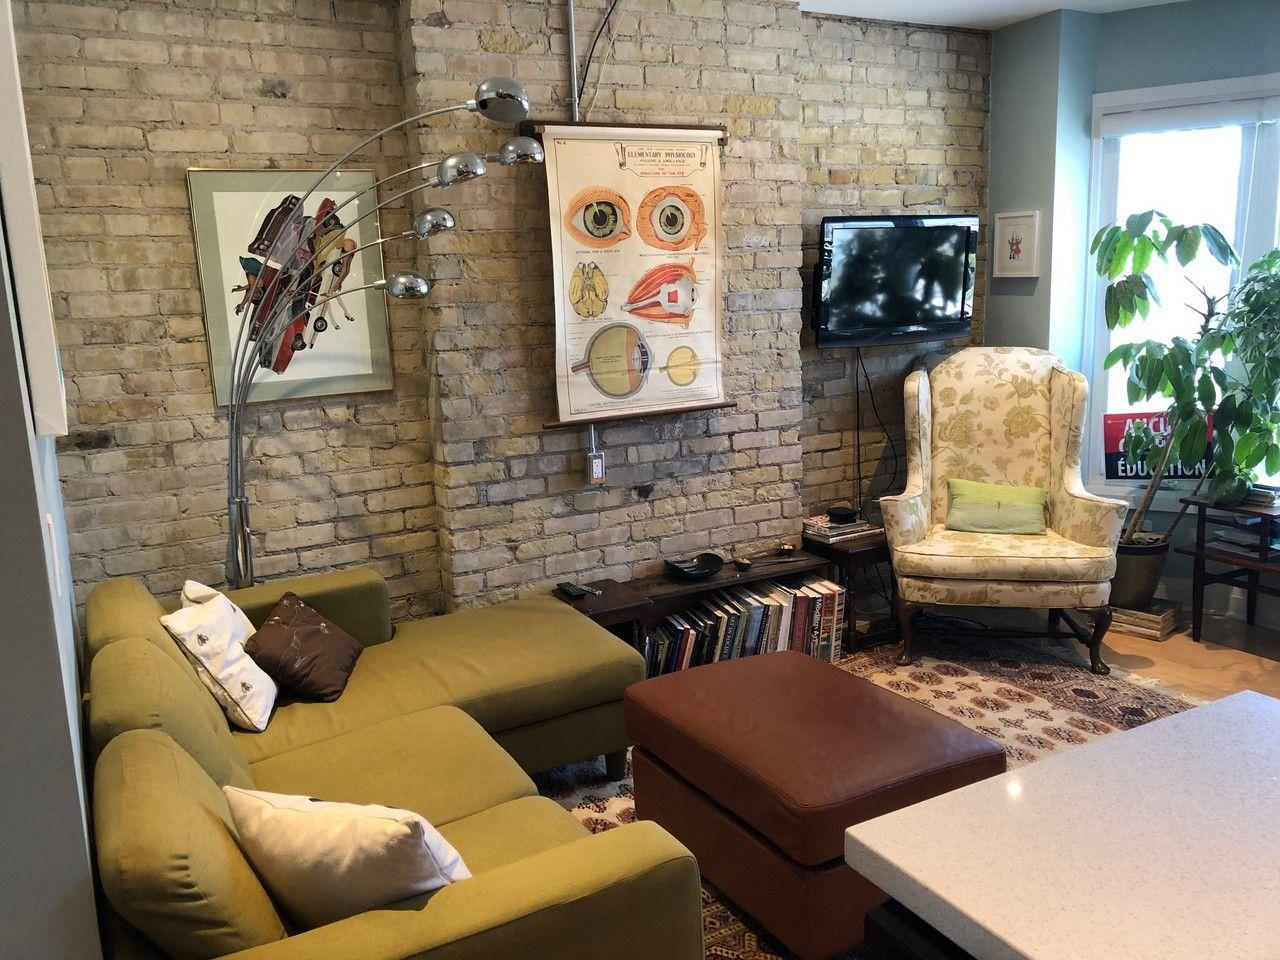 Magnificent 1017 Bathurst Street Toronto On M5R 3G8 2 Bedroom Download Free Architecture Designs Sospemadebymaigaardcom